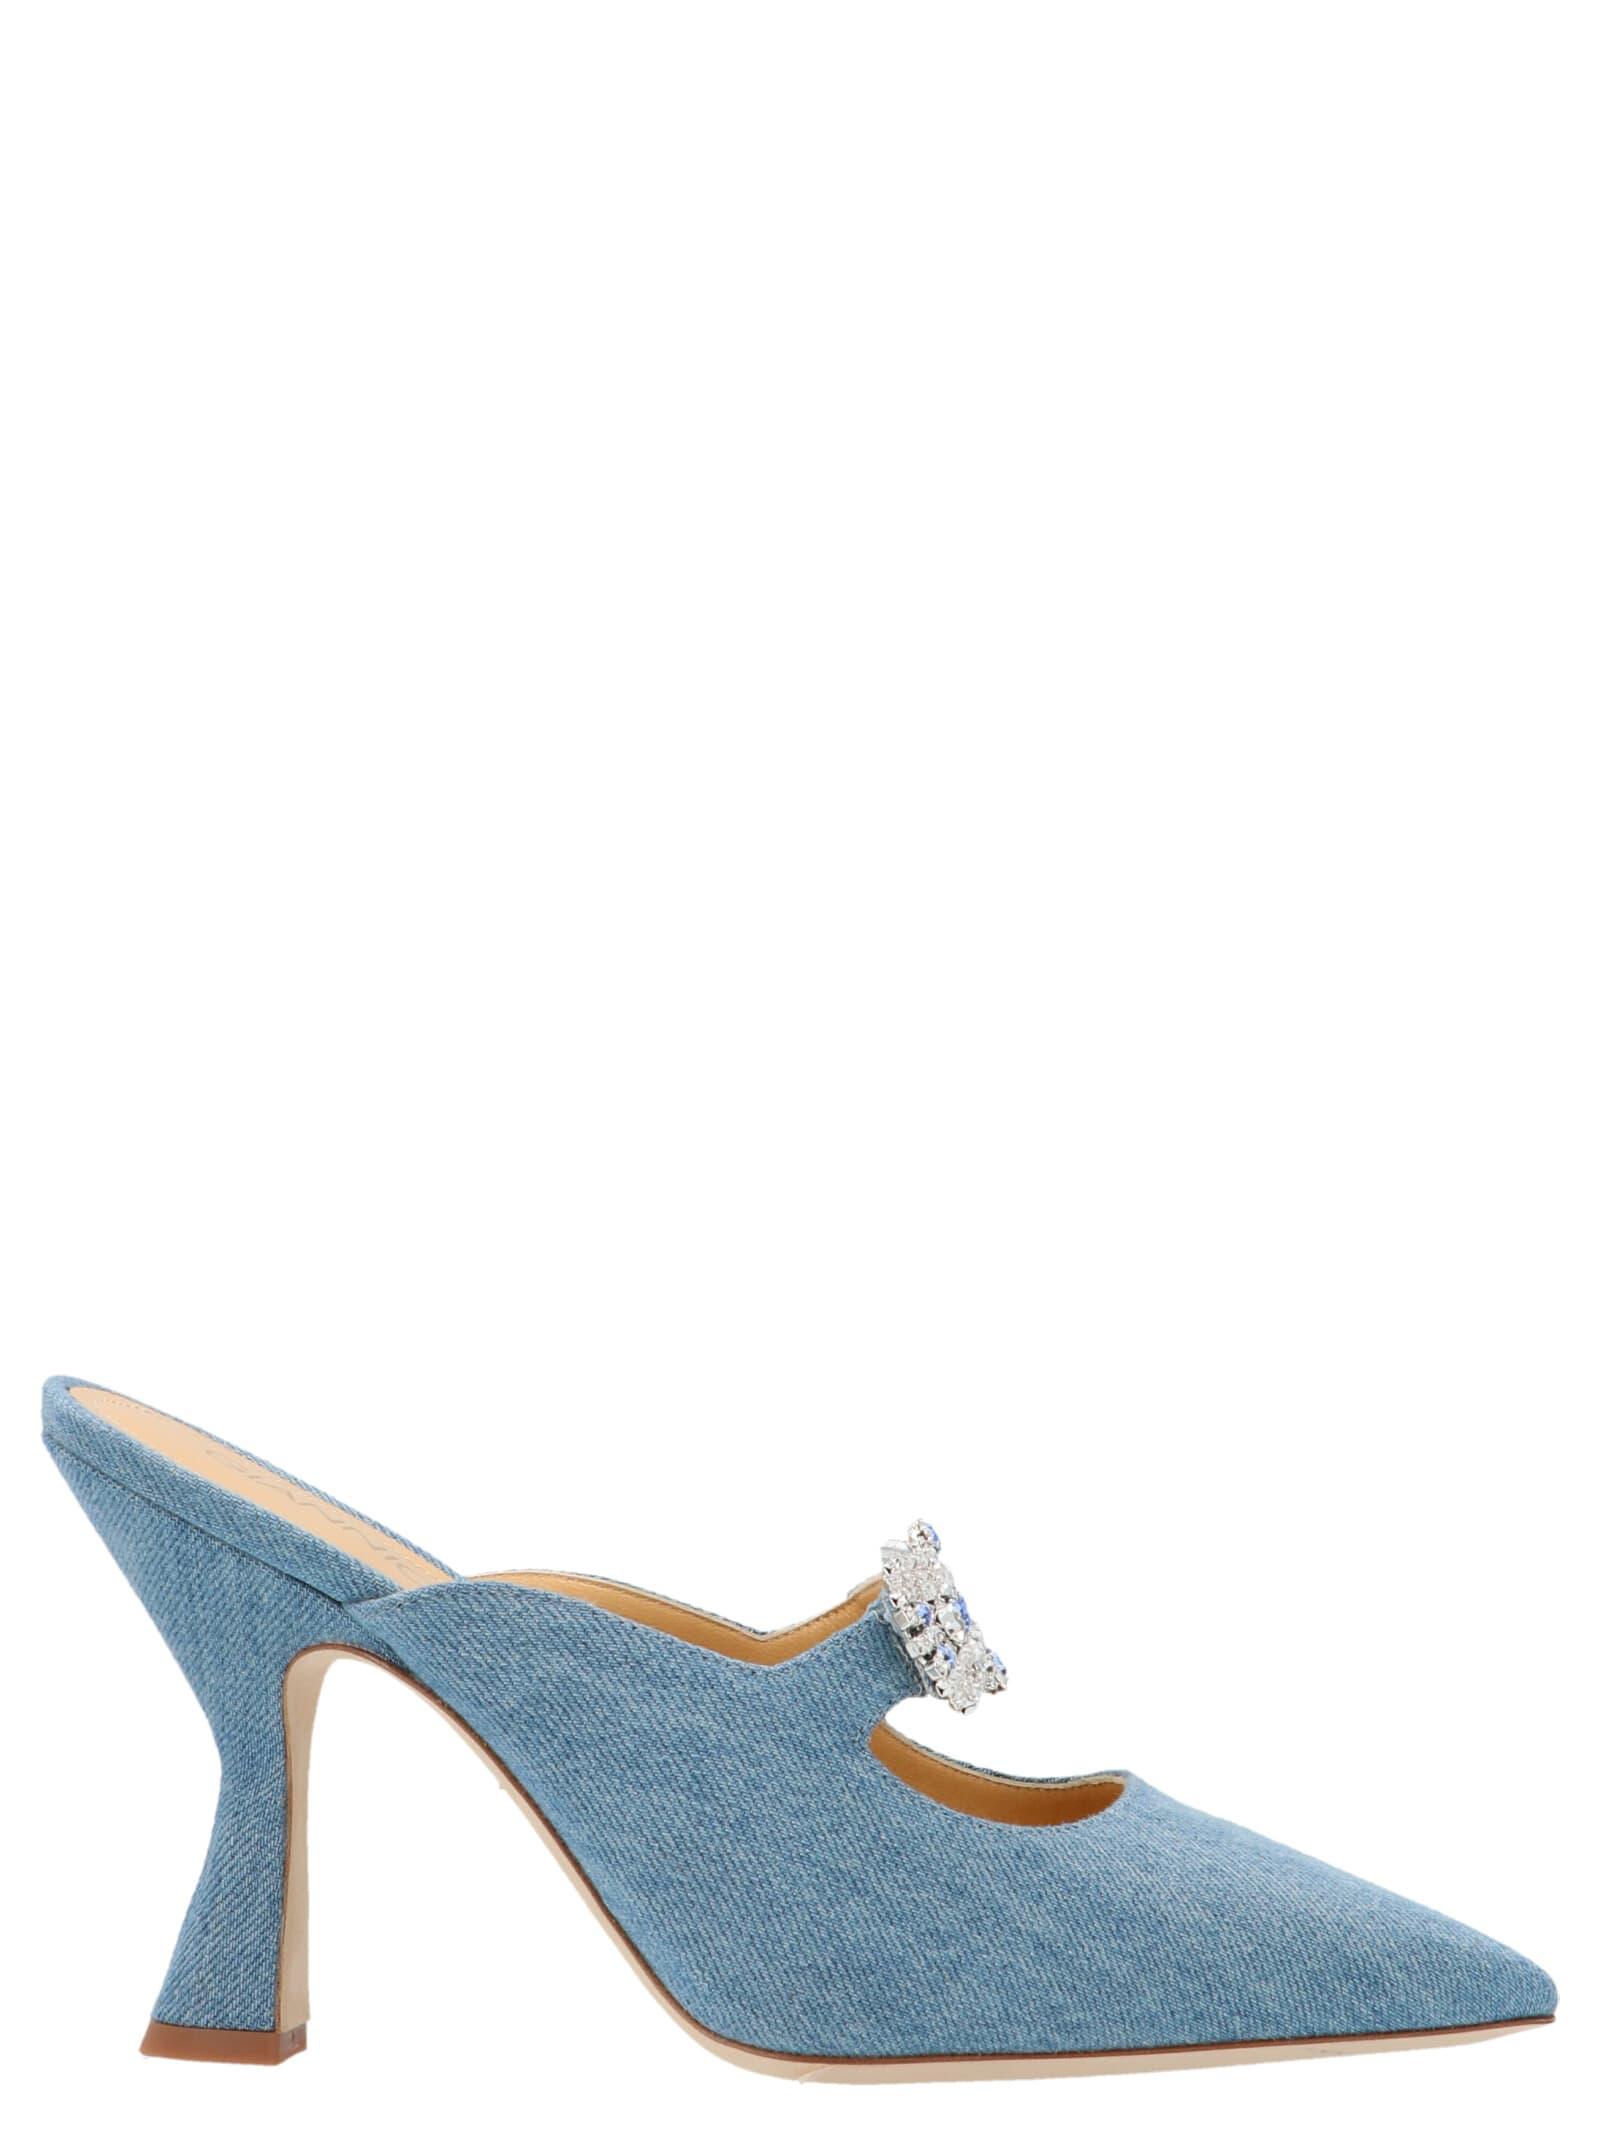 penelope Shoes